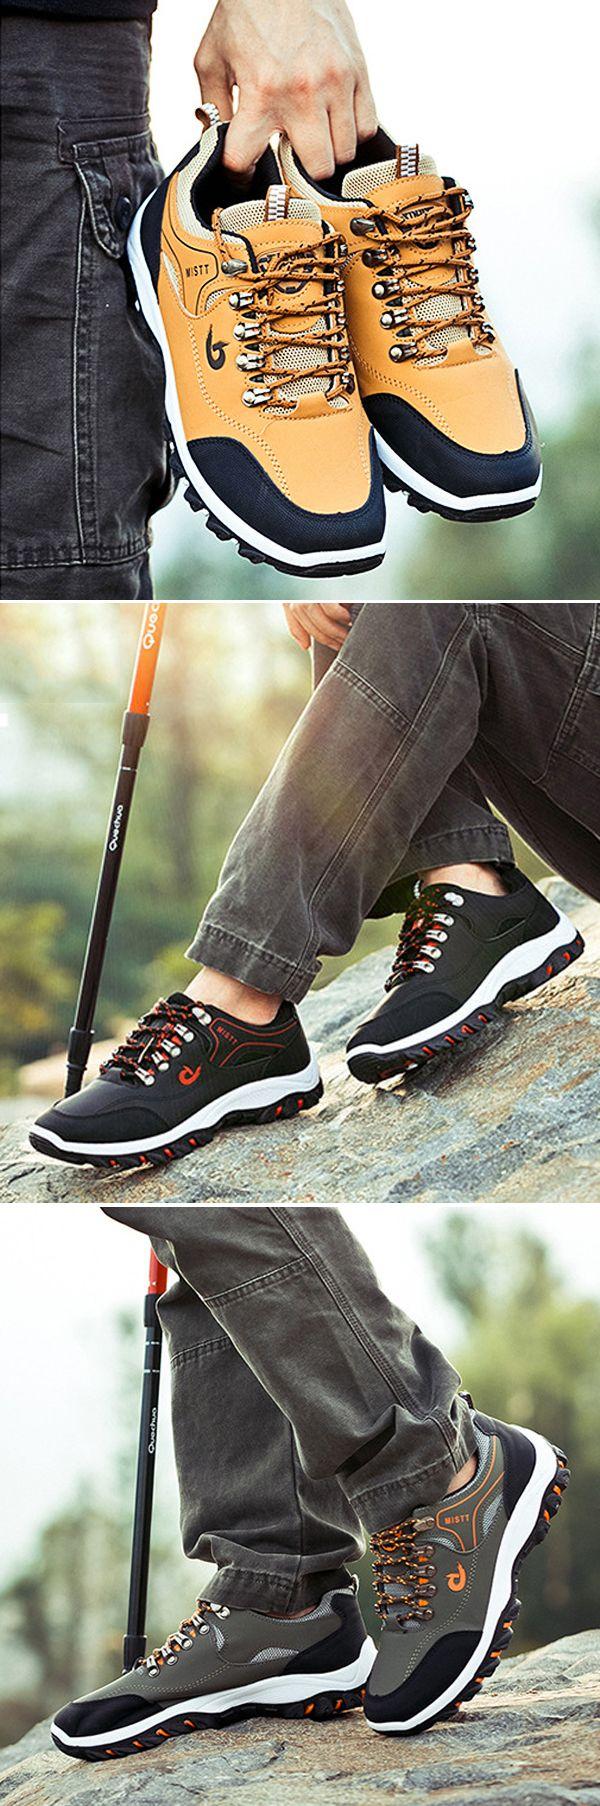 US$24.99 Men Hiking Metal Buckle Outdoor Shock-absorbing Slip Resistant Sneakers